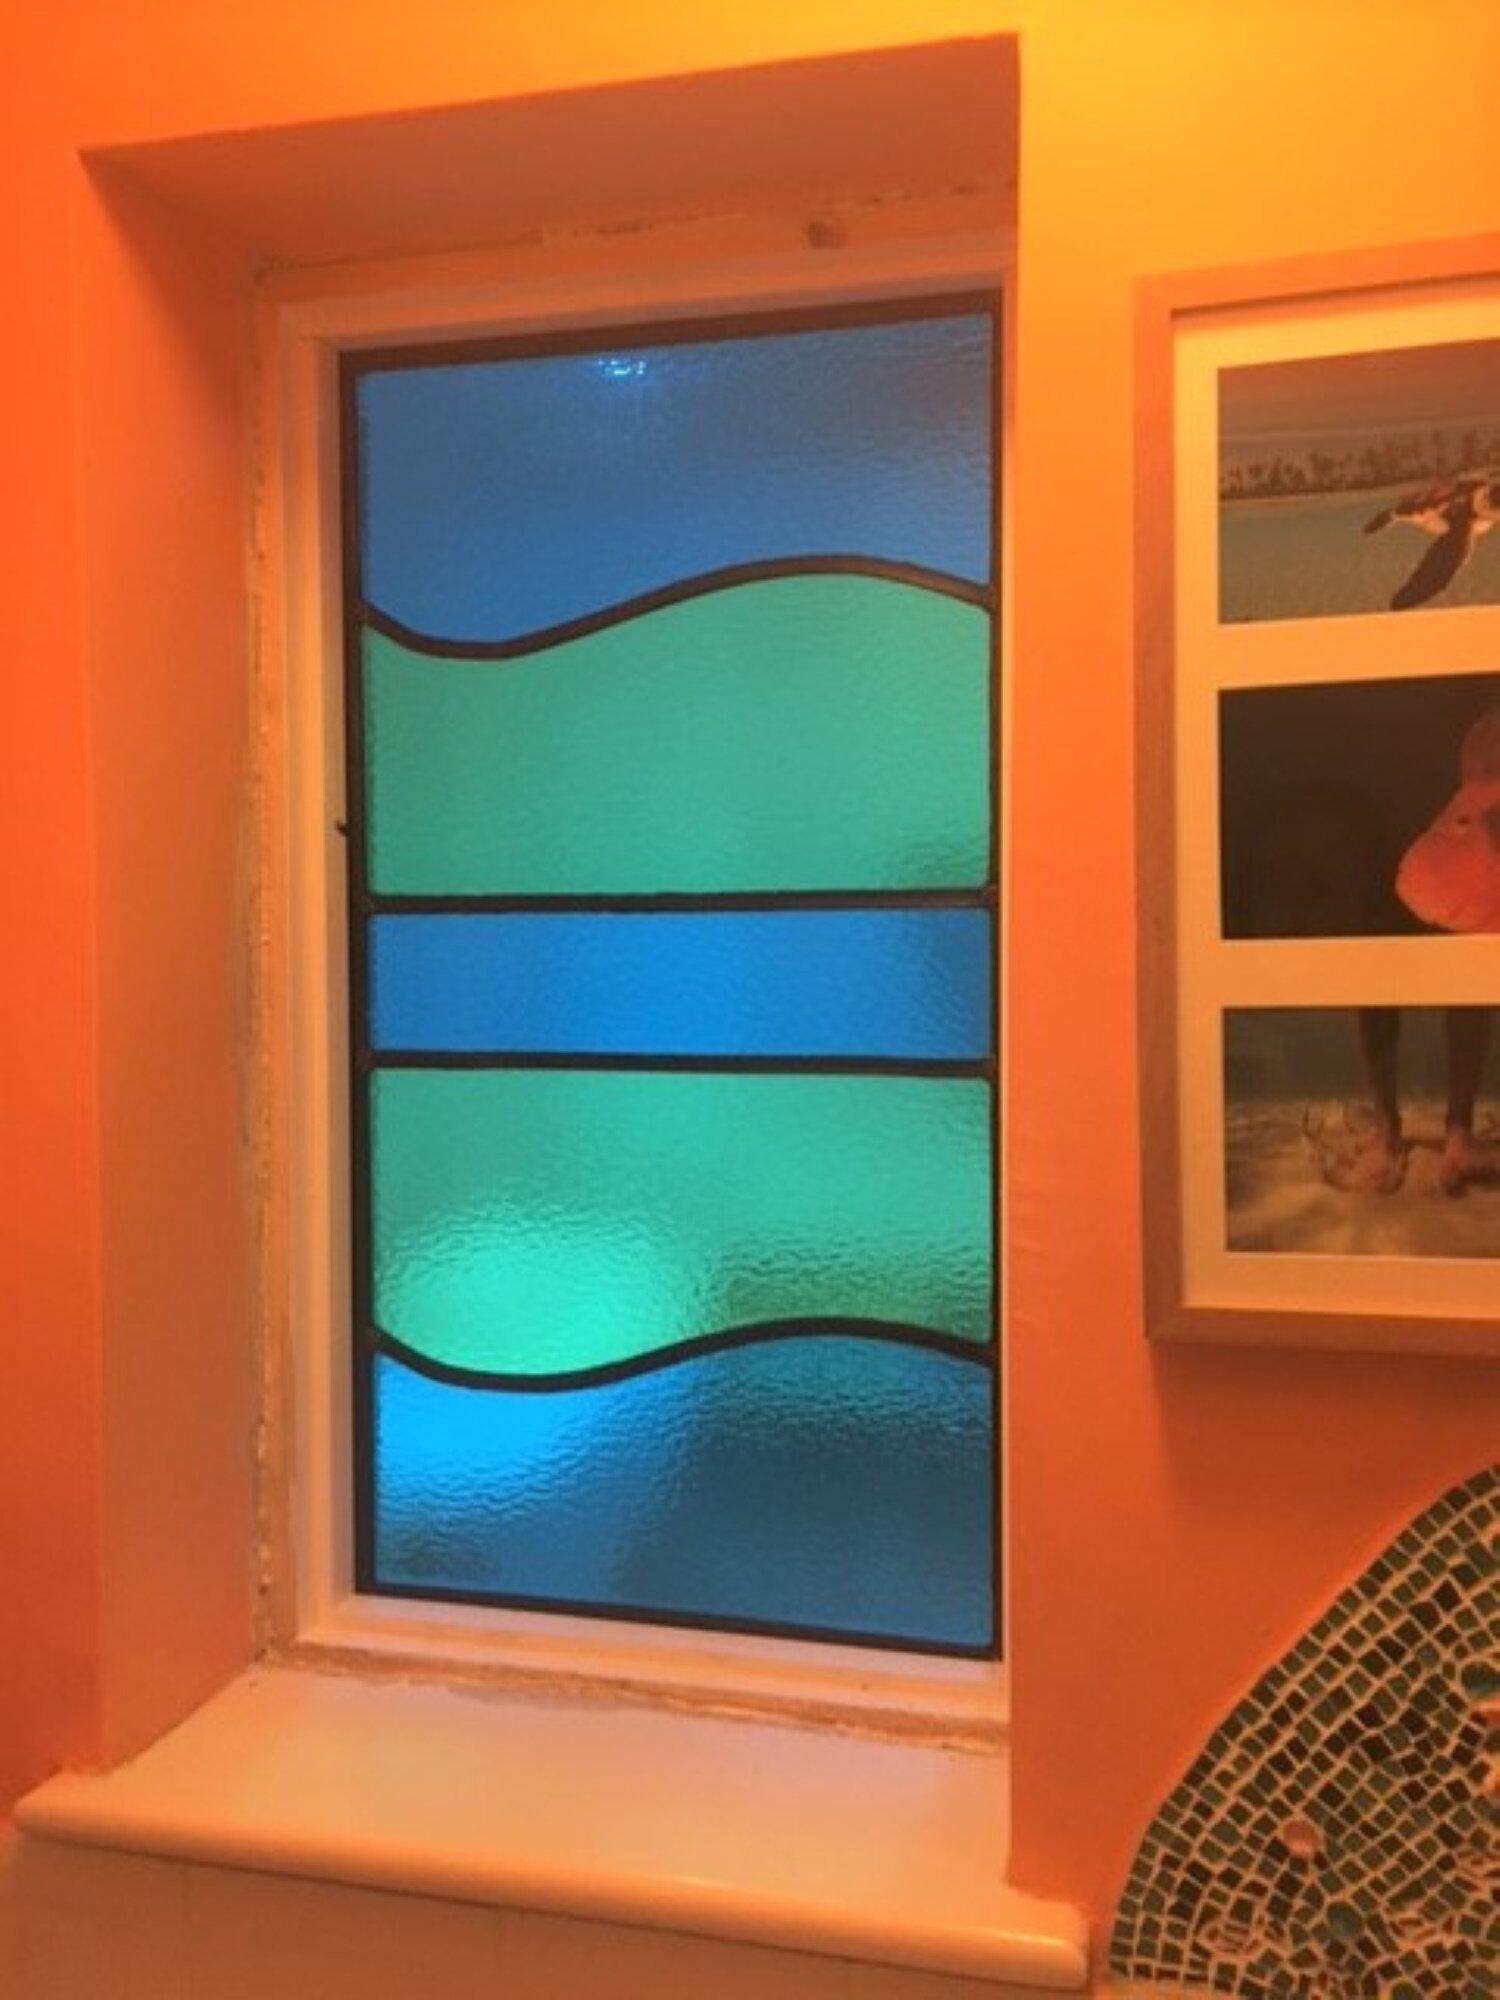 eva-glass-design-blue-green-stained-glass-window.jpg